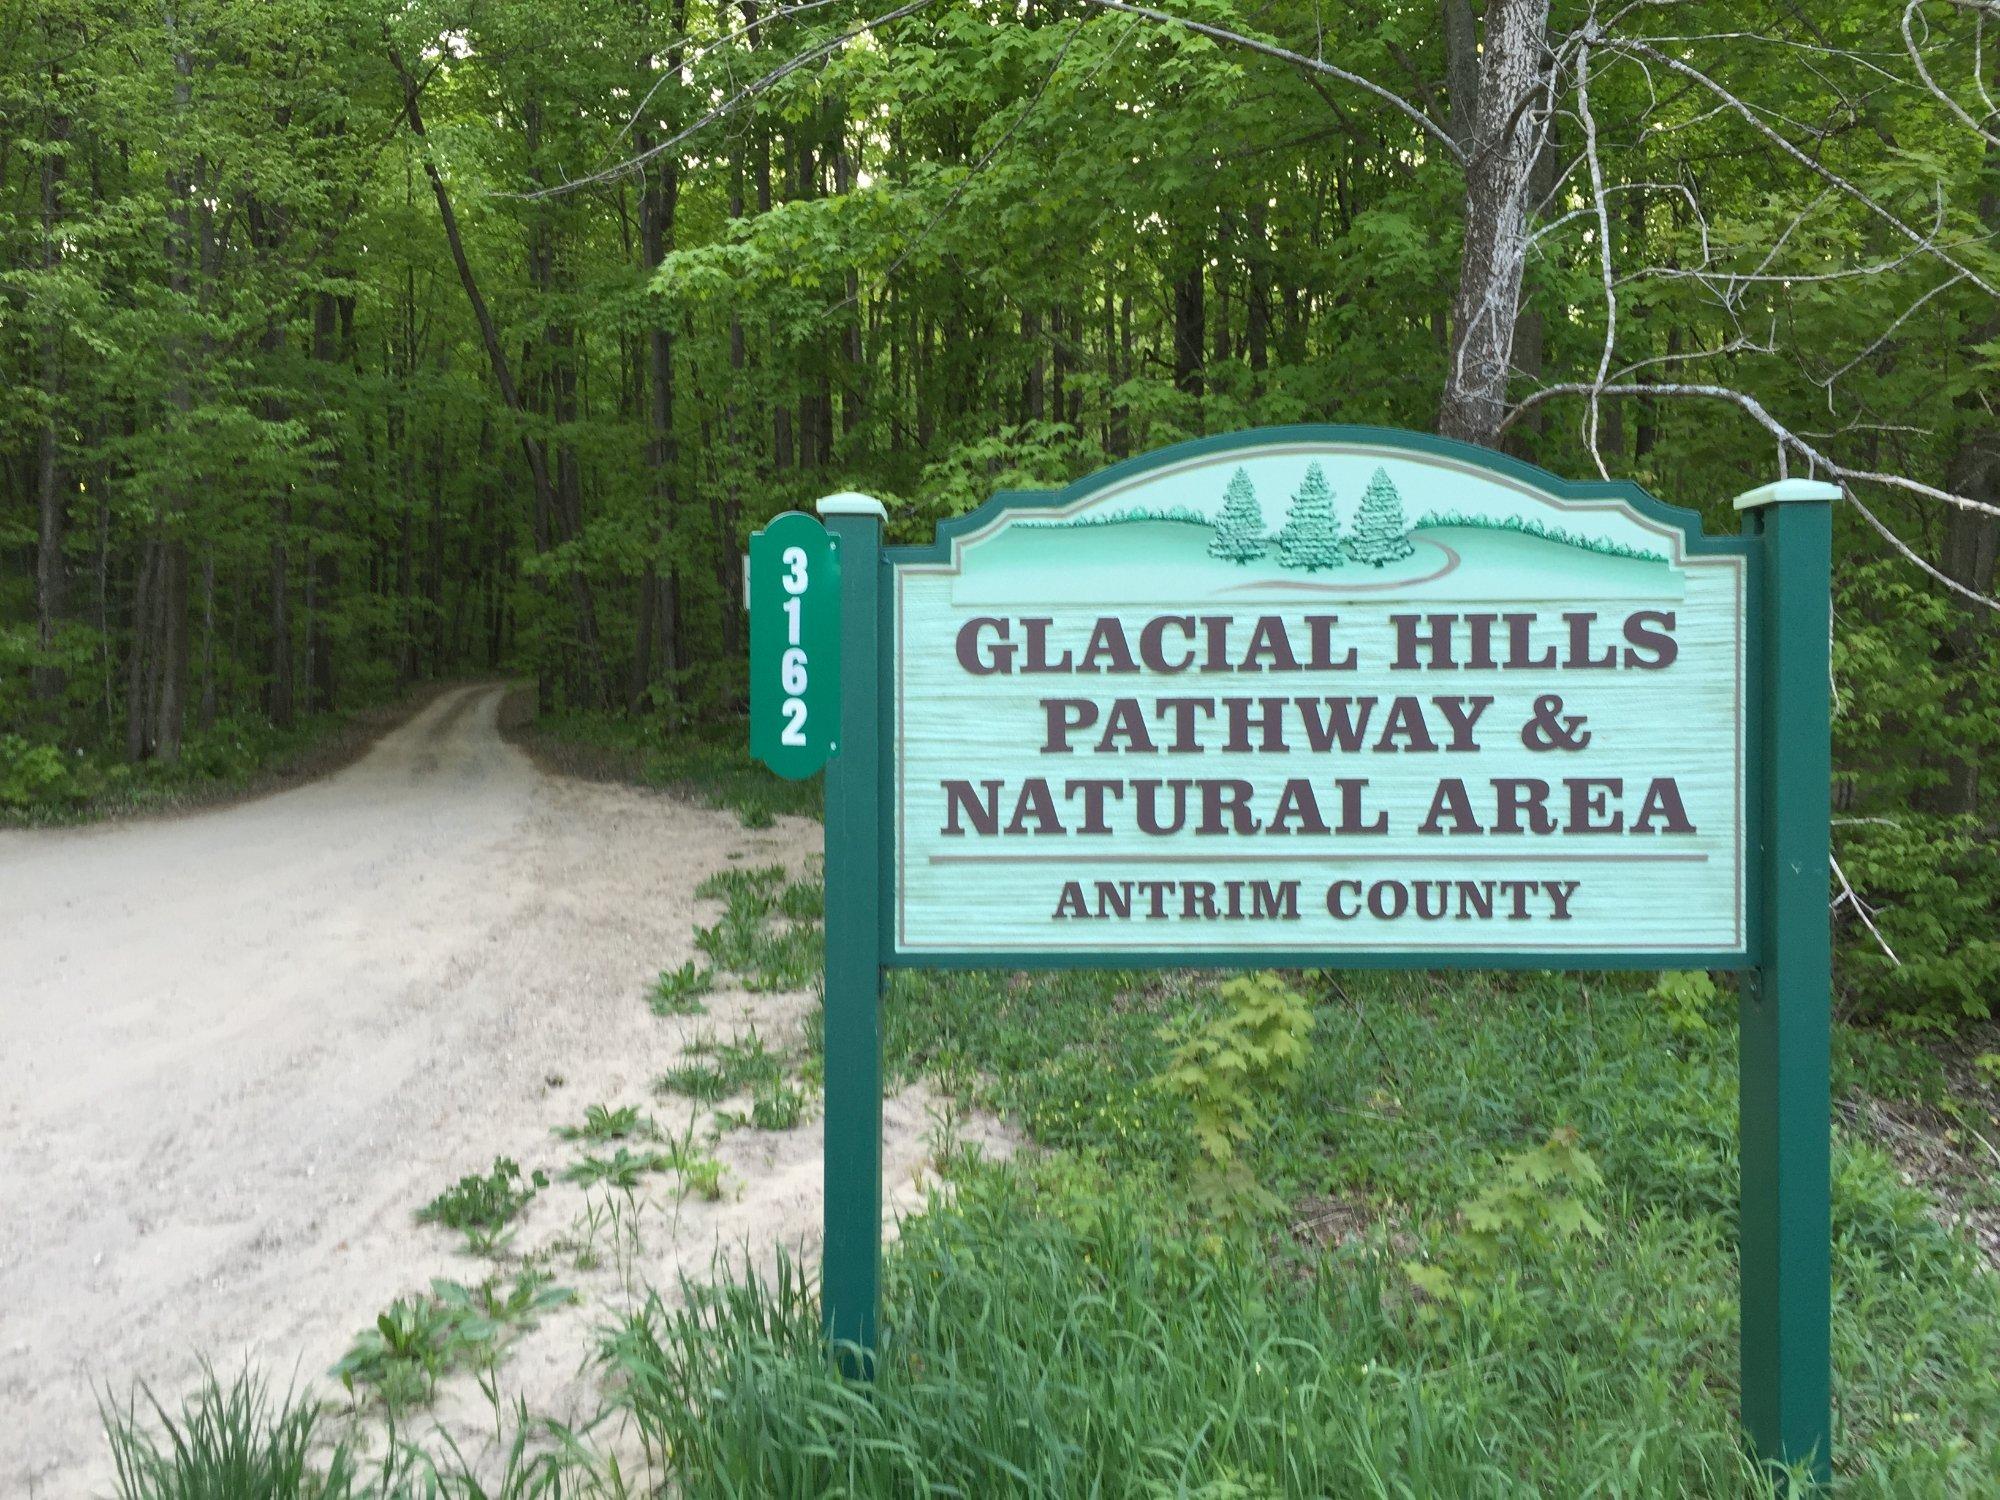 Michigan antrim county kewadin - Glacial Hills Pathway And Natural Area